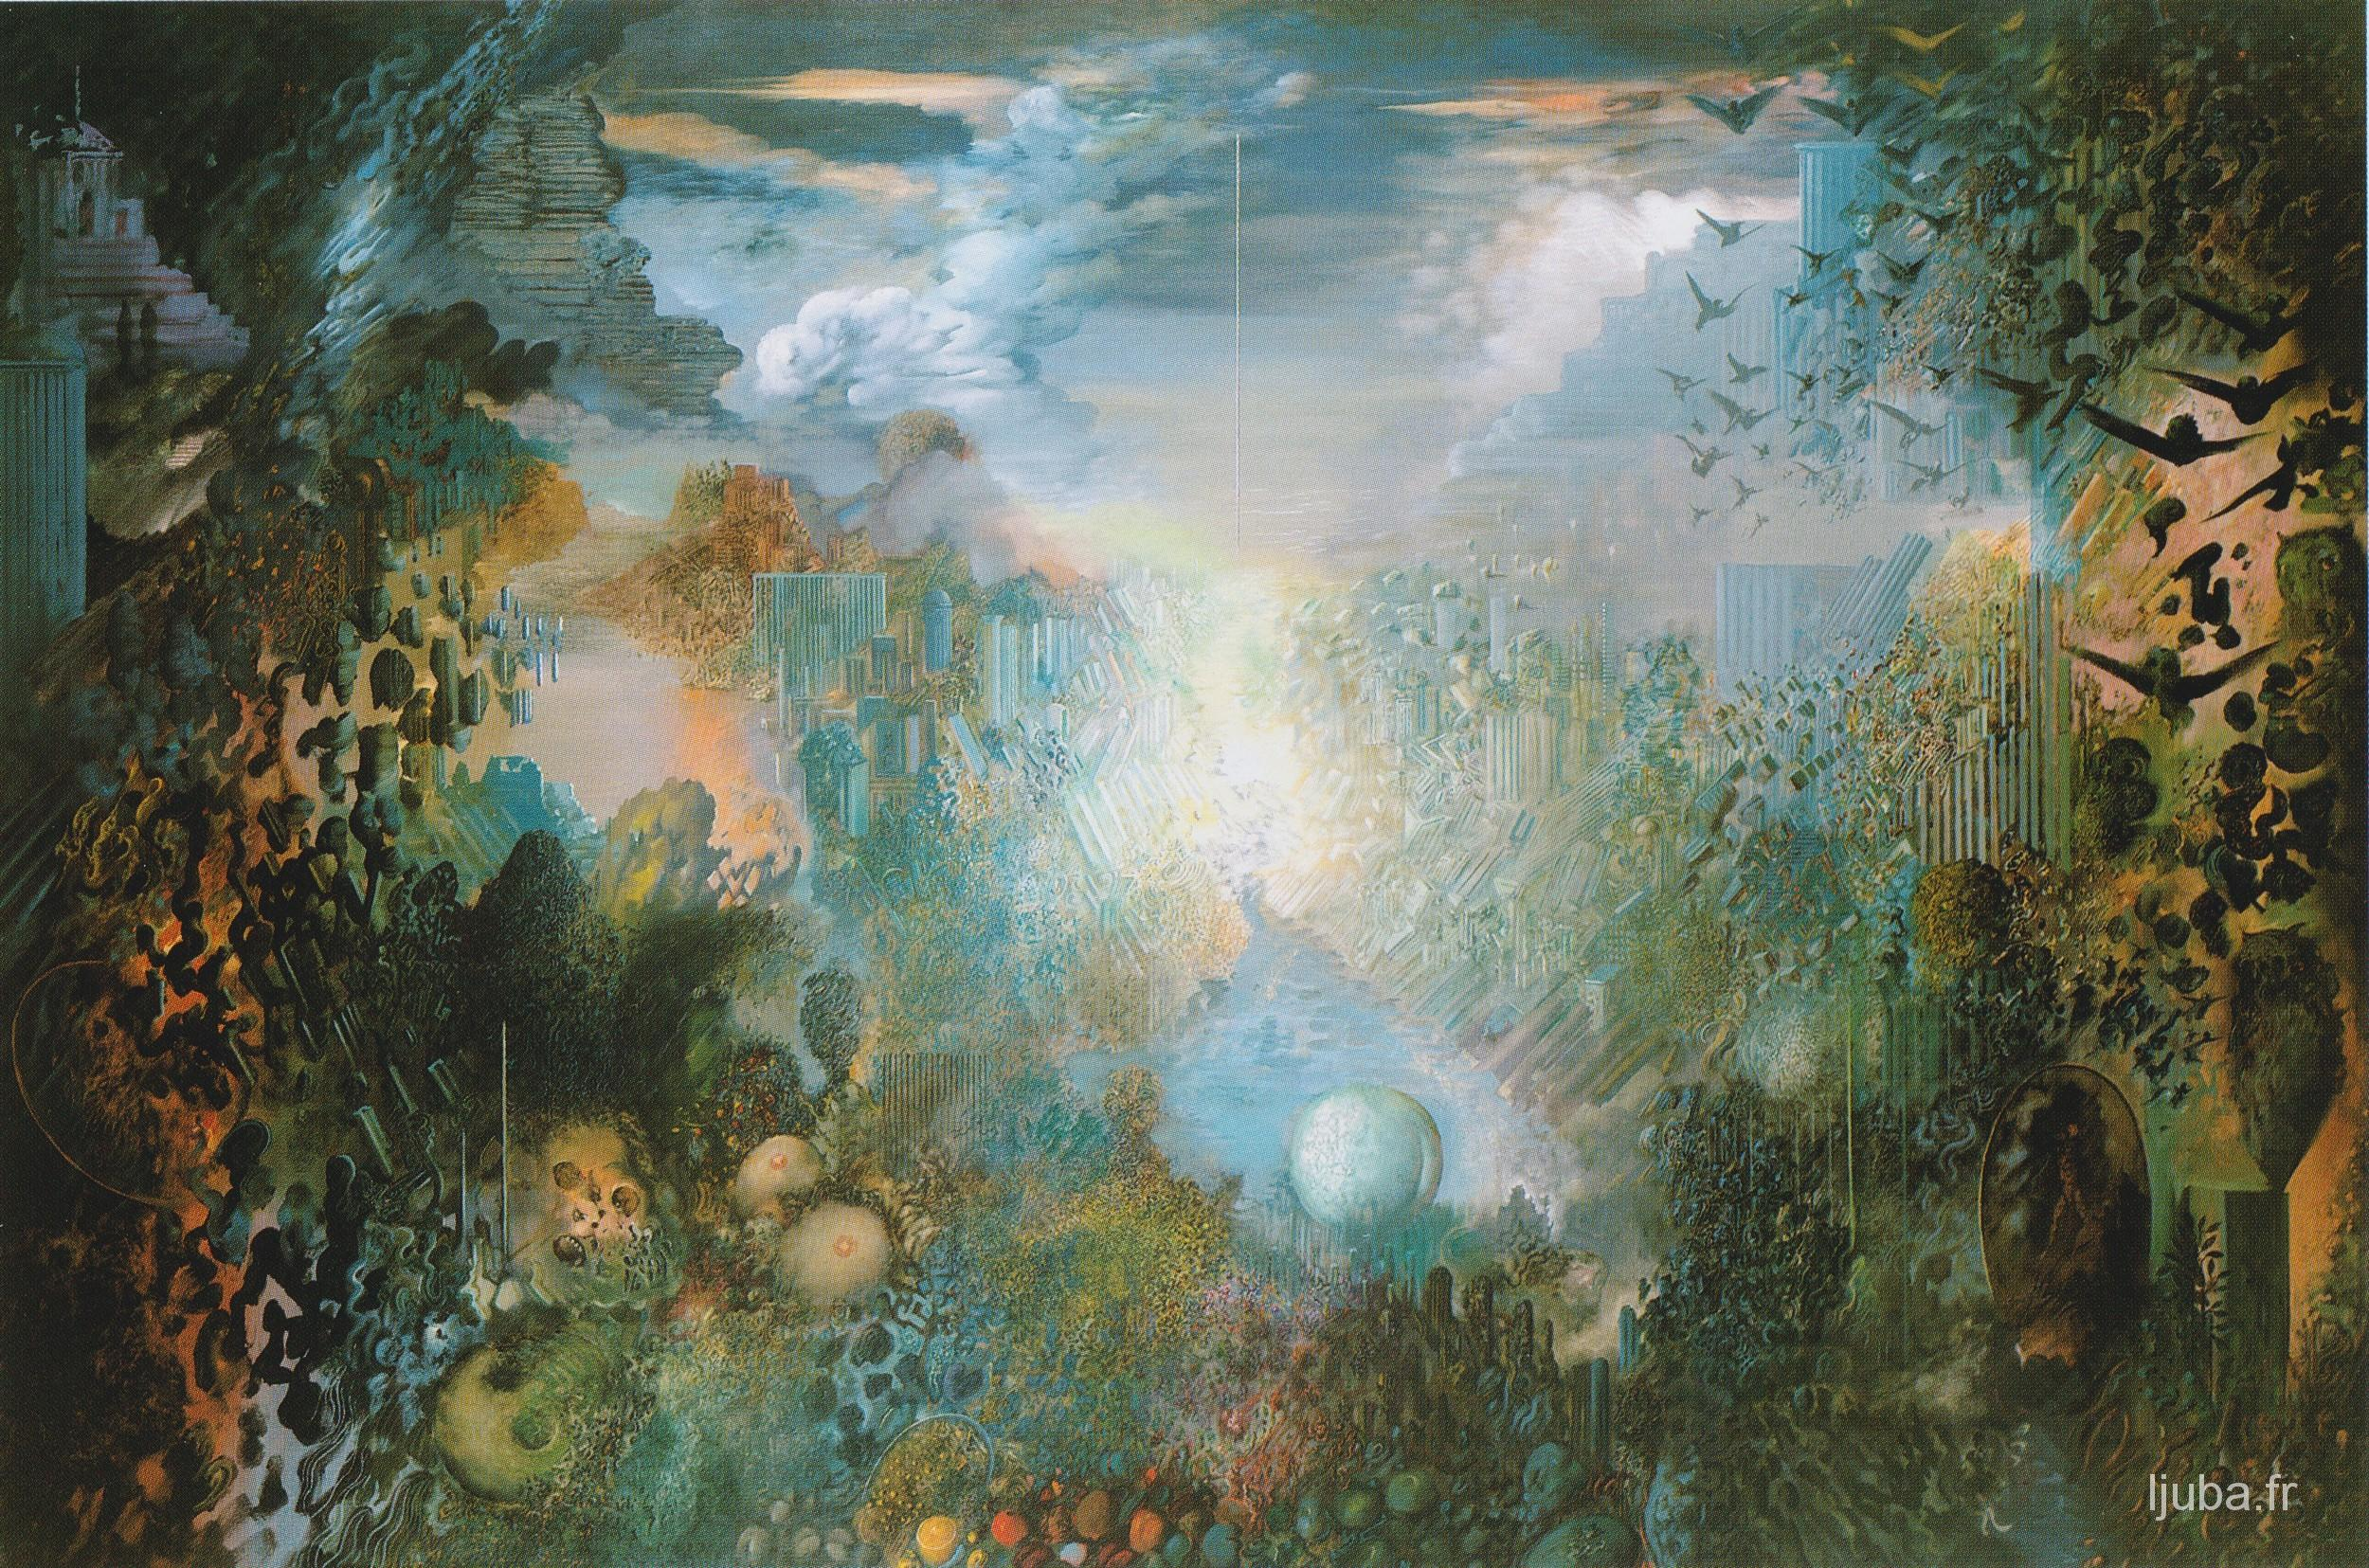 Ljuba Popovic - Le lieu de l'enterrement, 1985-84